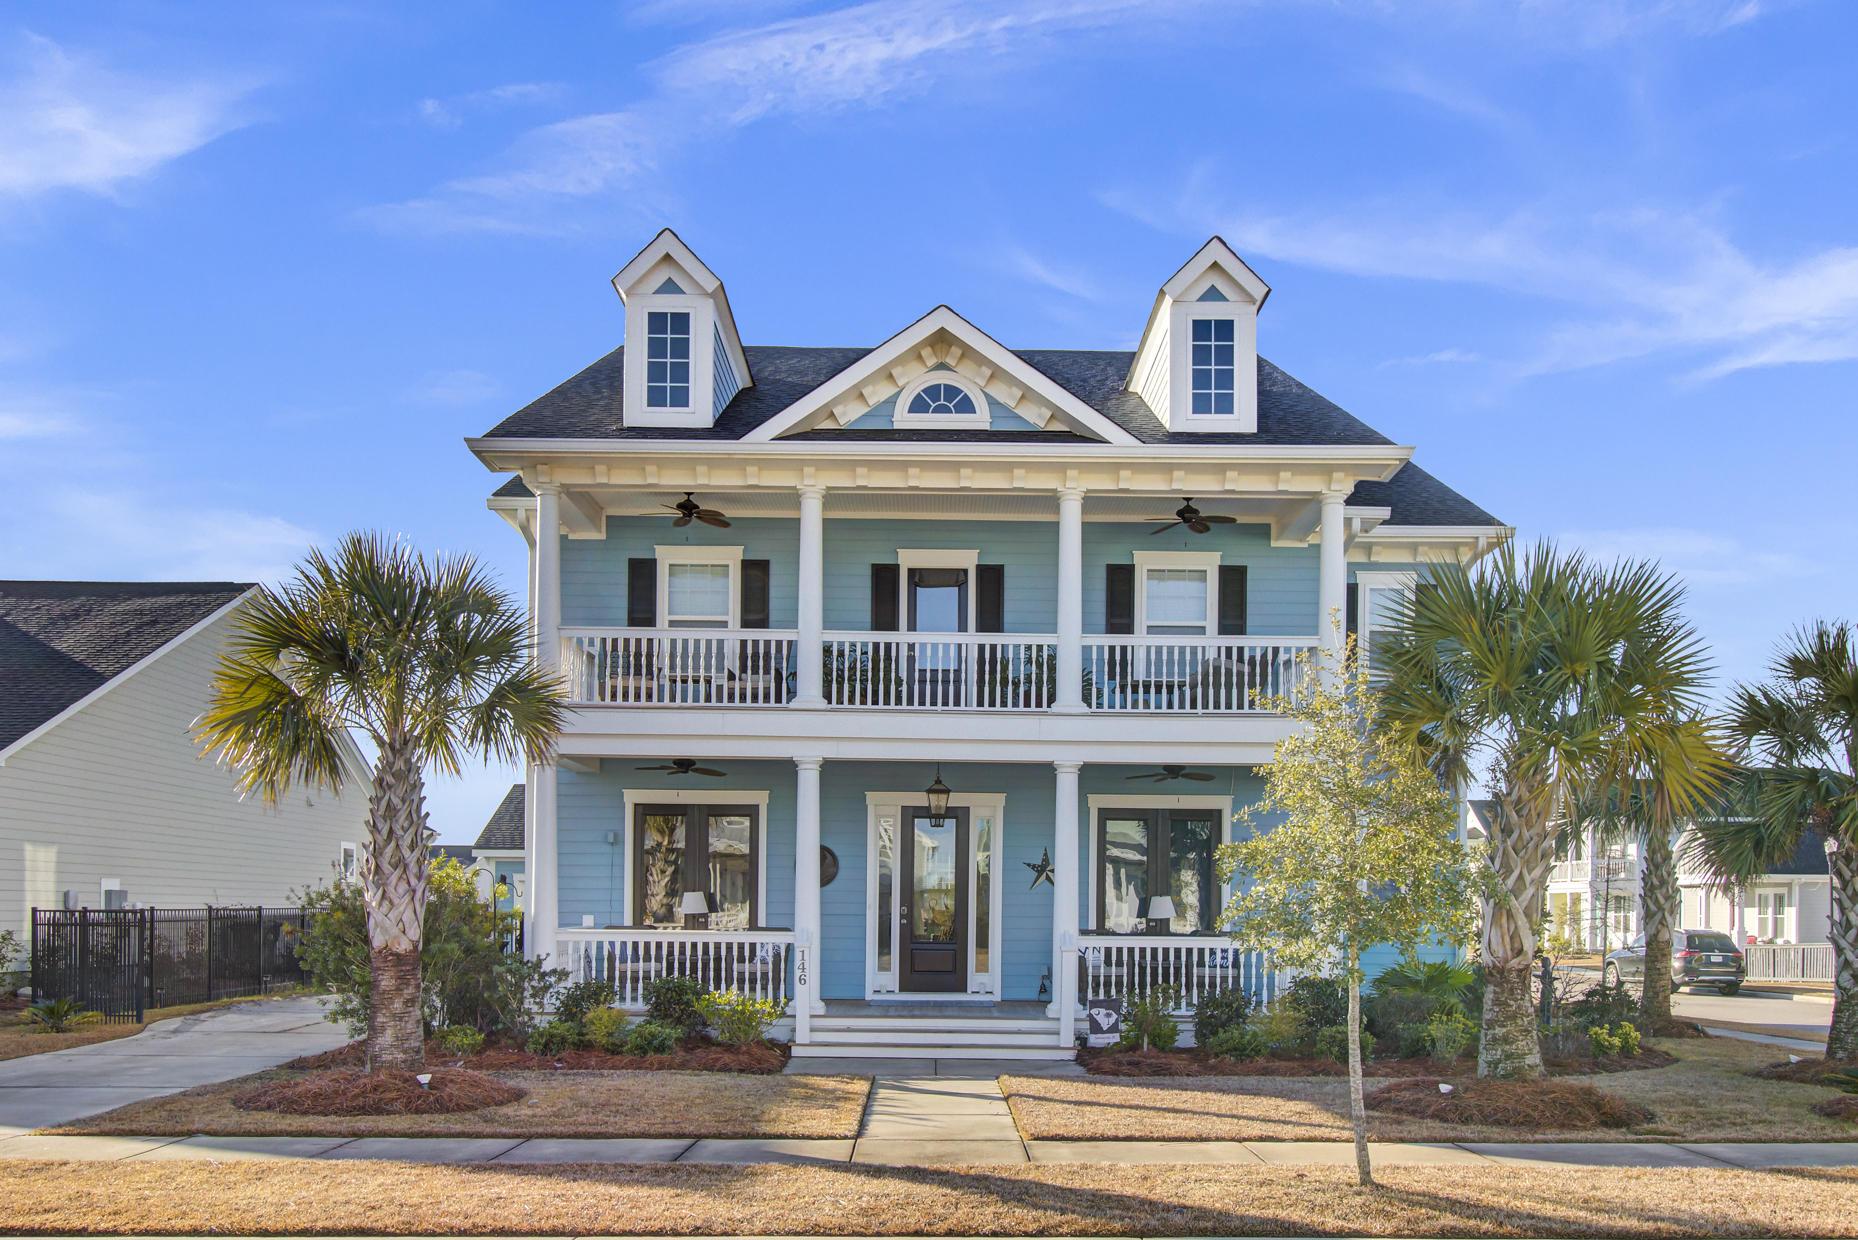 Carnes Crossroads Homes For Sale - 146 Callibluff, Summerville, SC - 10